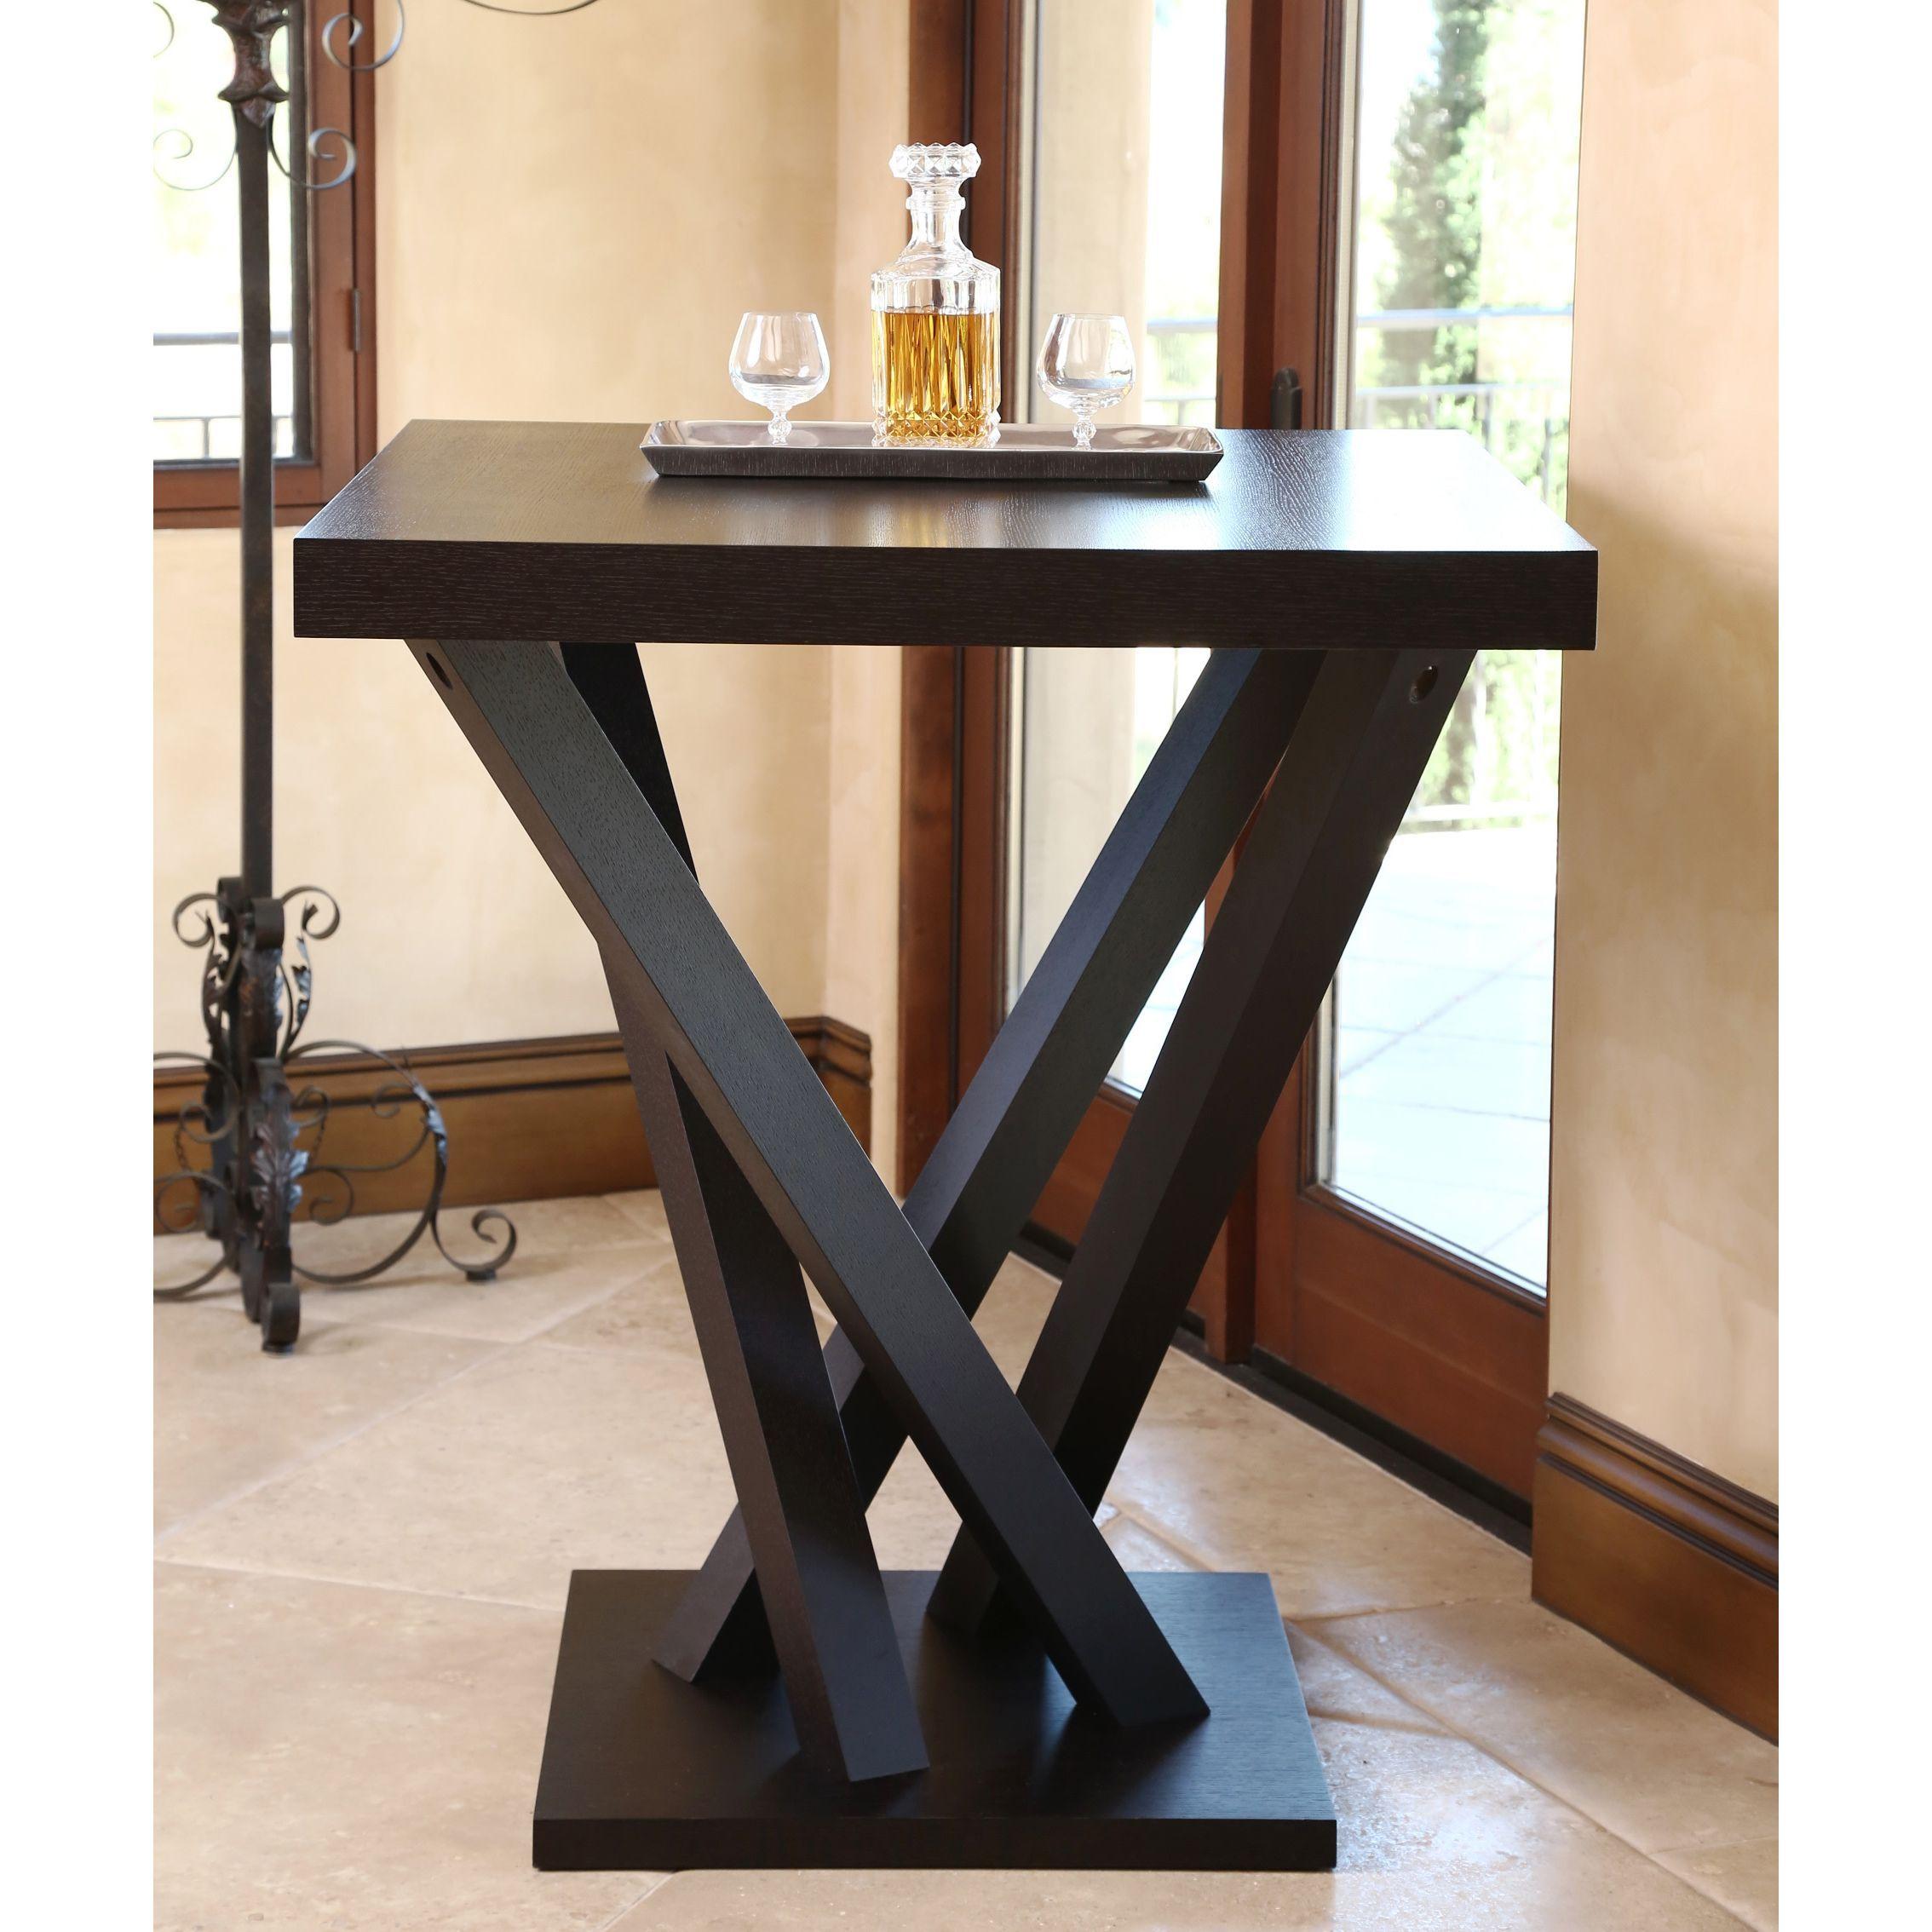 ABBYSON LIVING Cosmo Espresso Wood Square Bar Table - Overstock ...